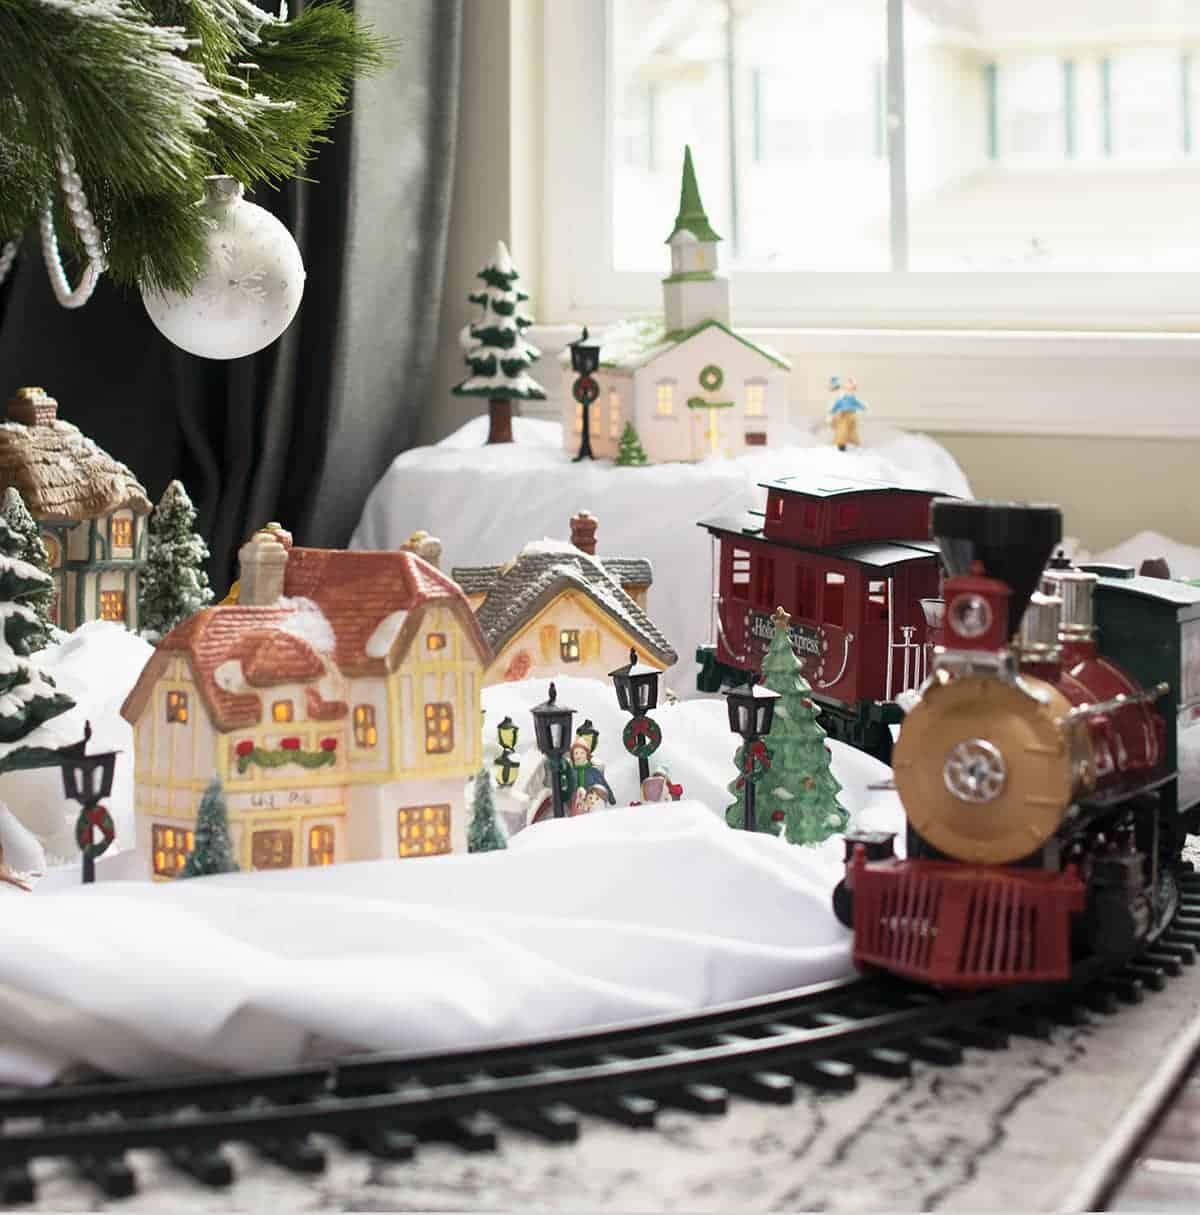 Vintage Christmas village set with antique train.